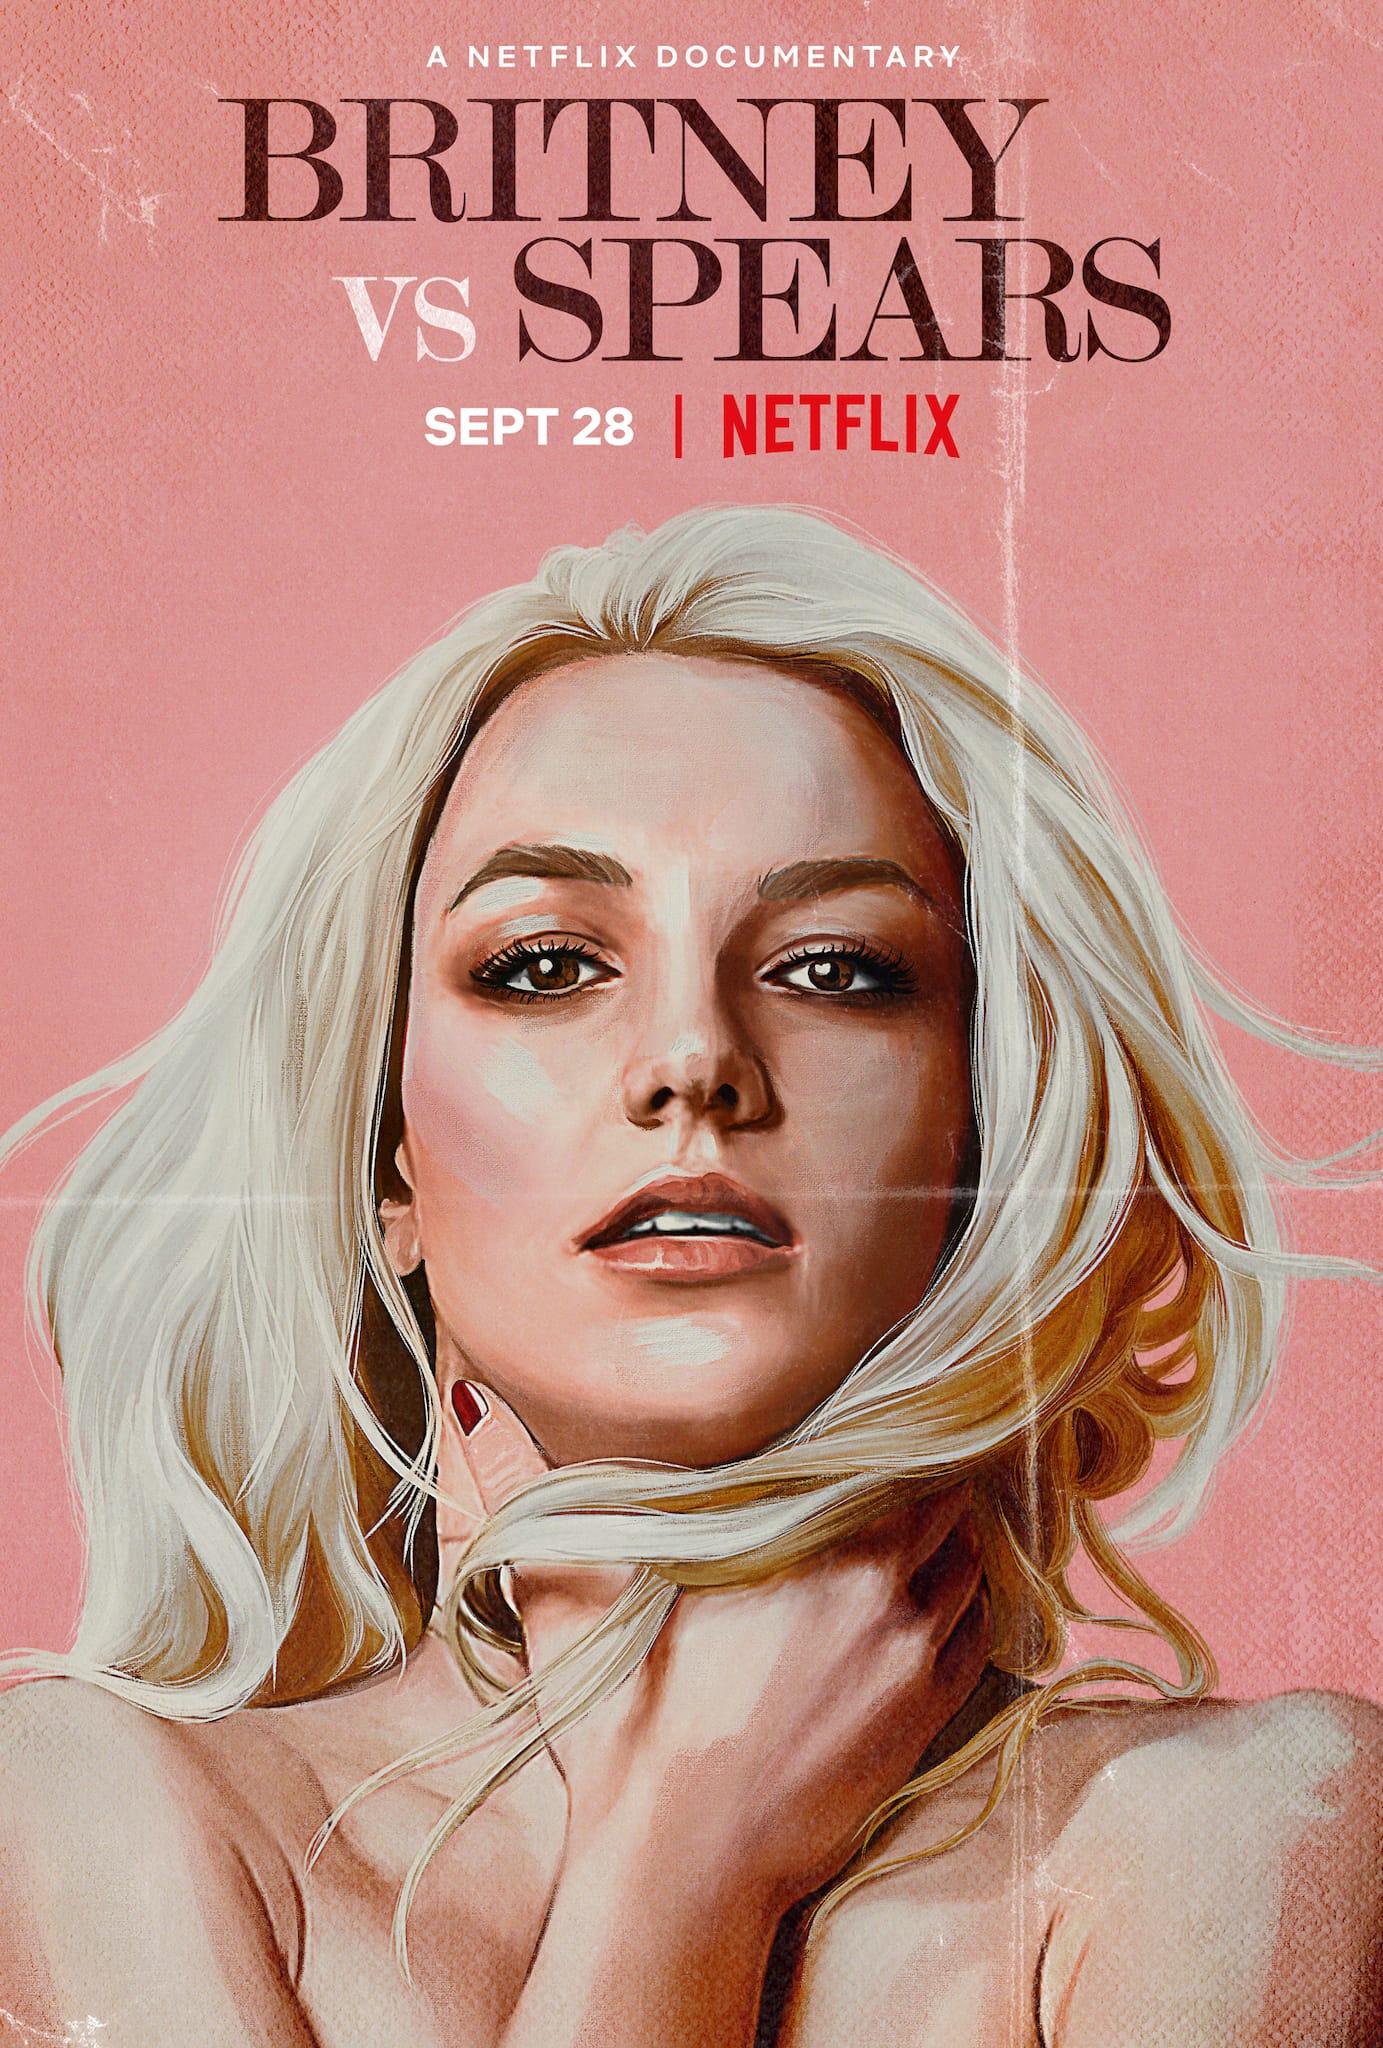 Britney Vs Spears d'Erin Lee Carr affiche documentaire Netflix